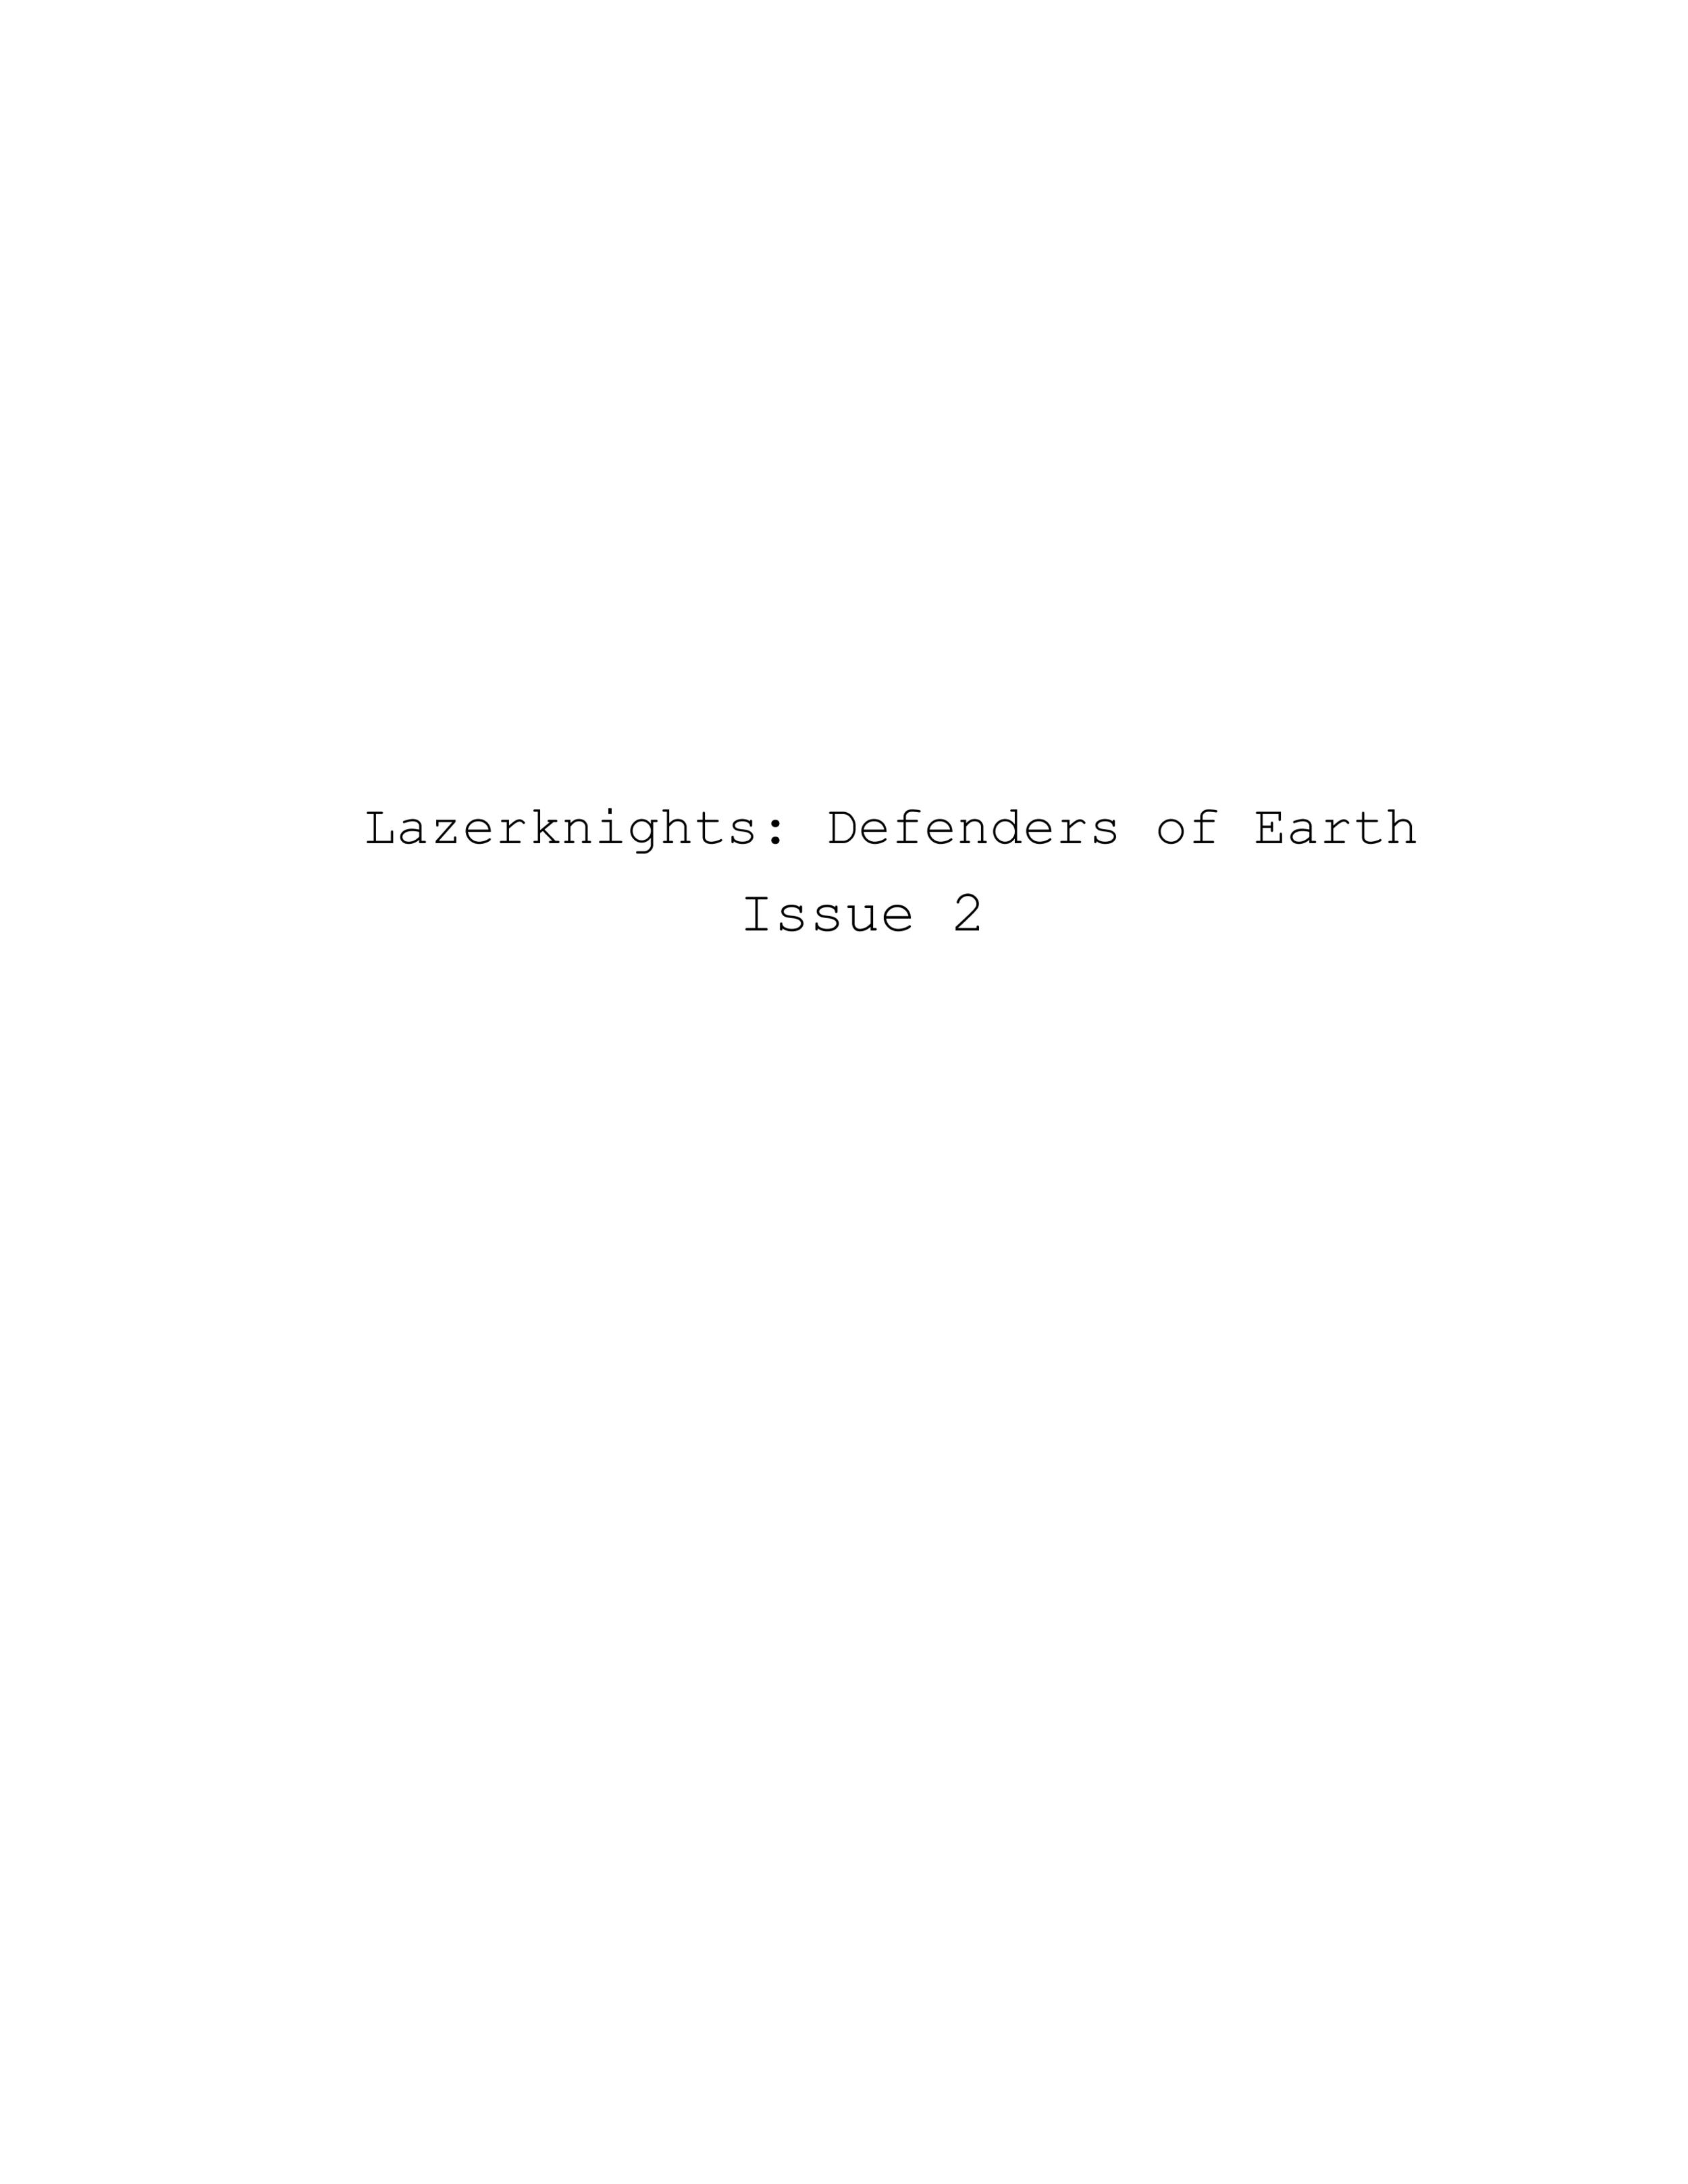 Lazerknights.png